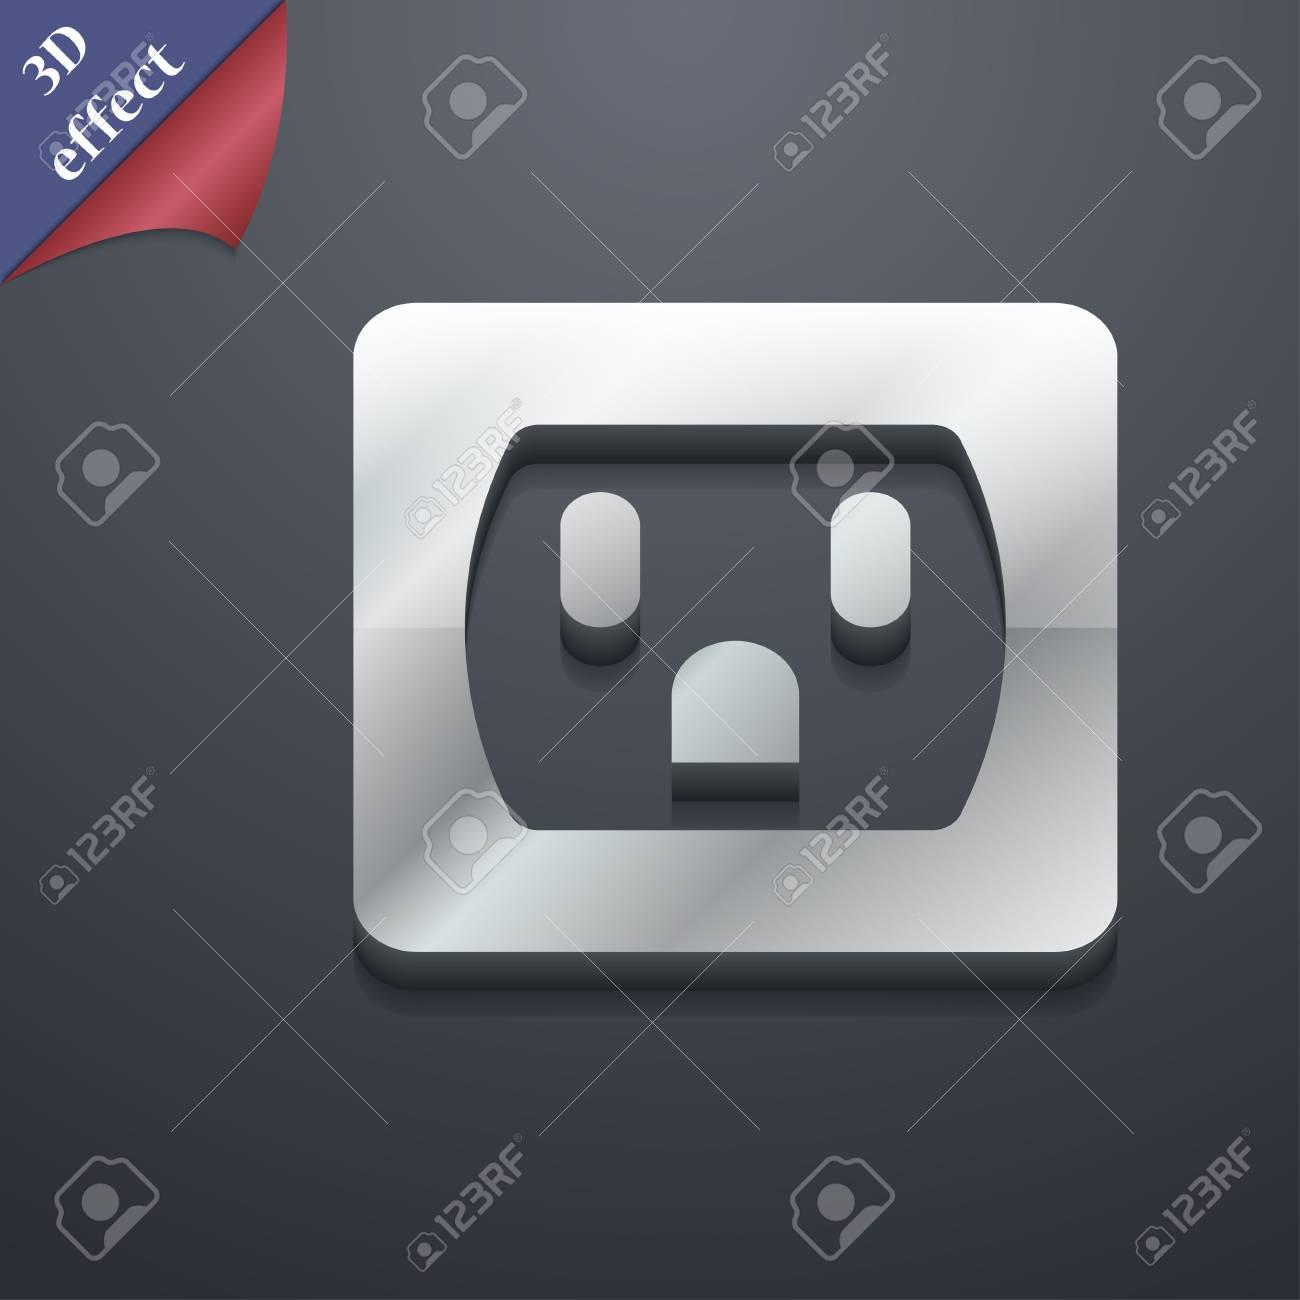 Electric Plug Power Energy Icon Symbol 3d Style Trendy Modern